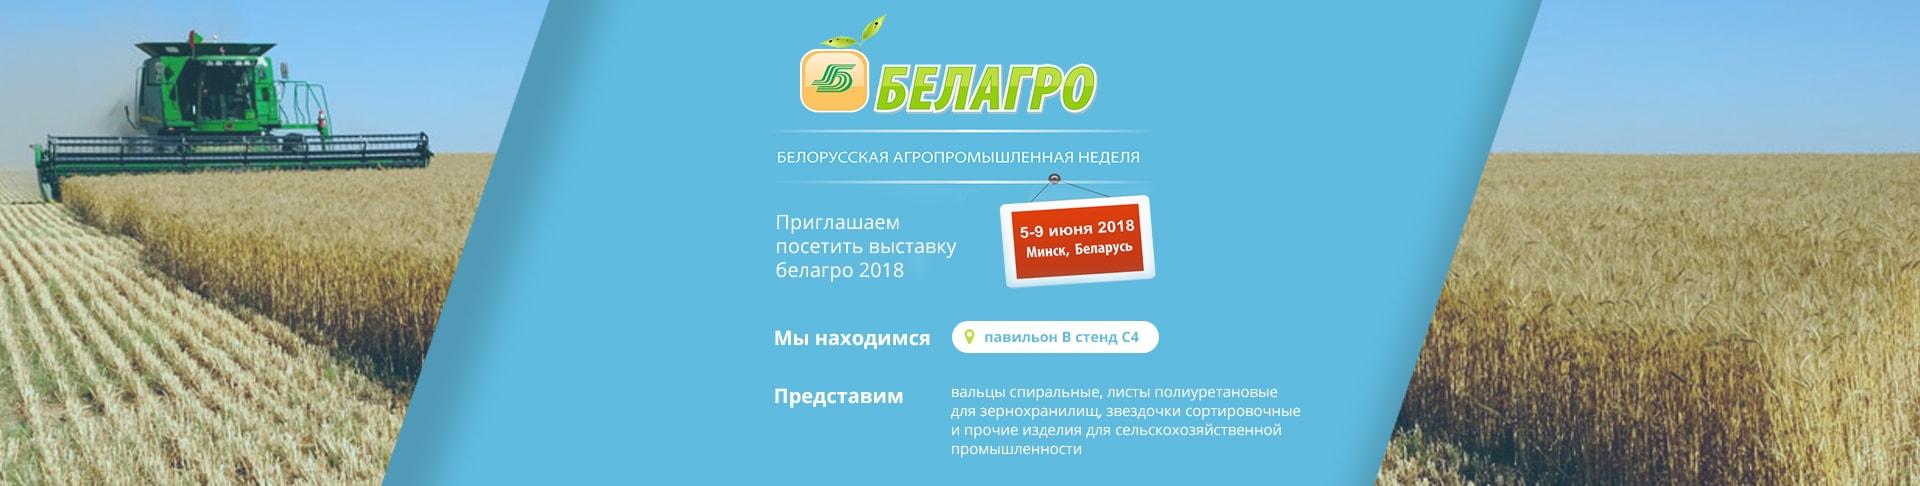 белагро20182